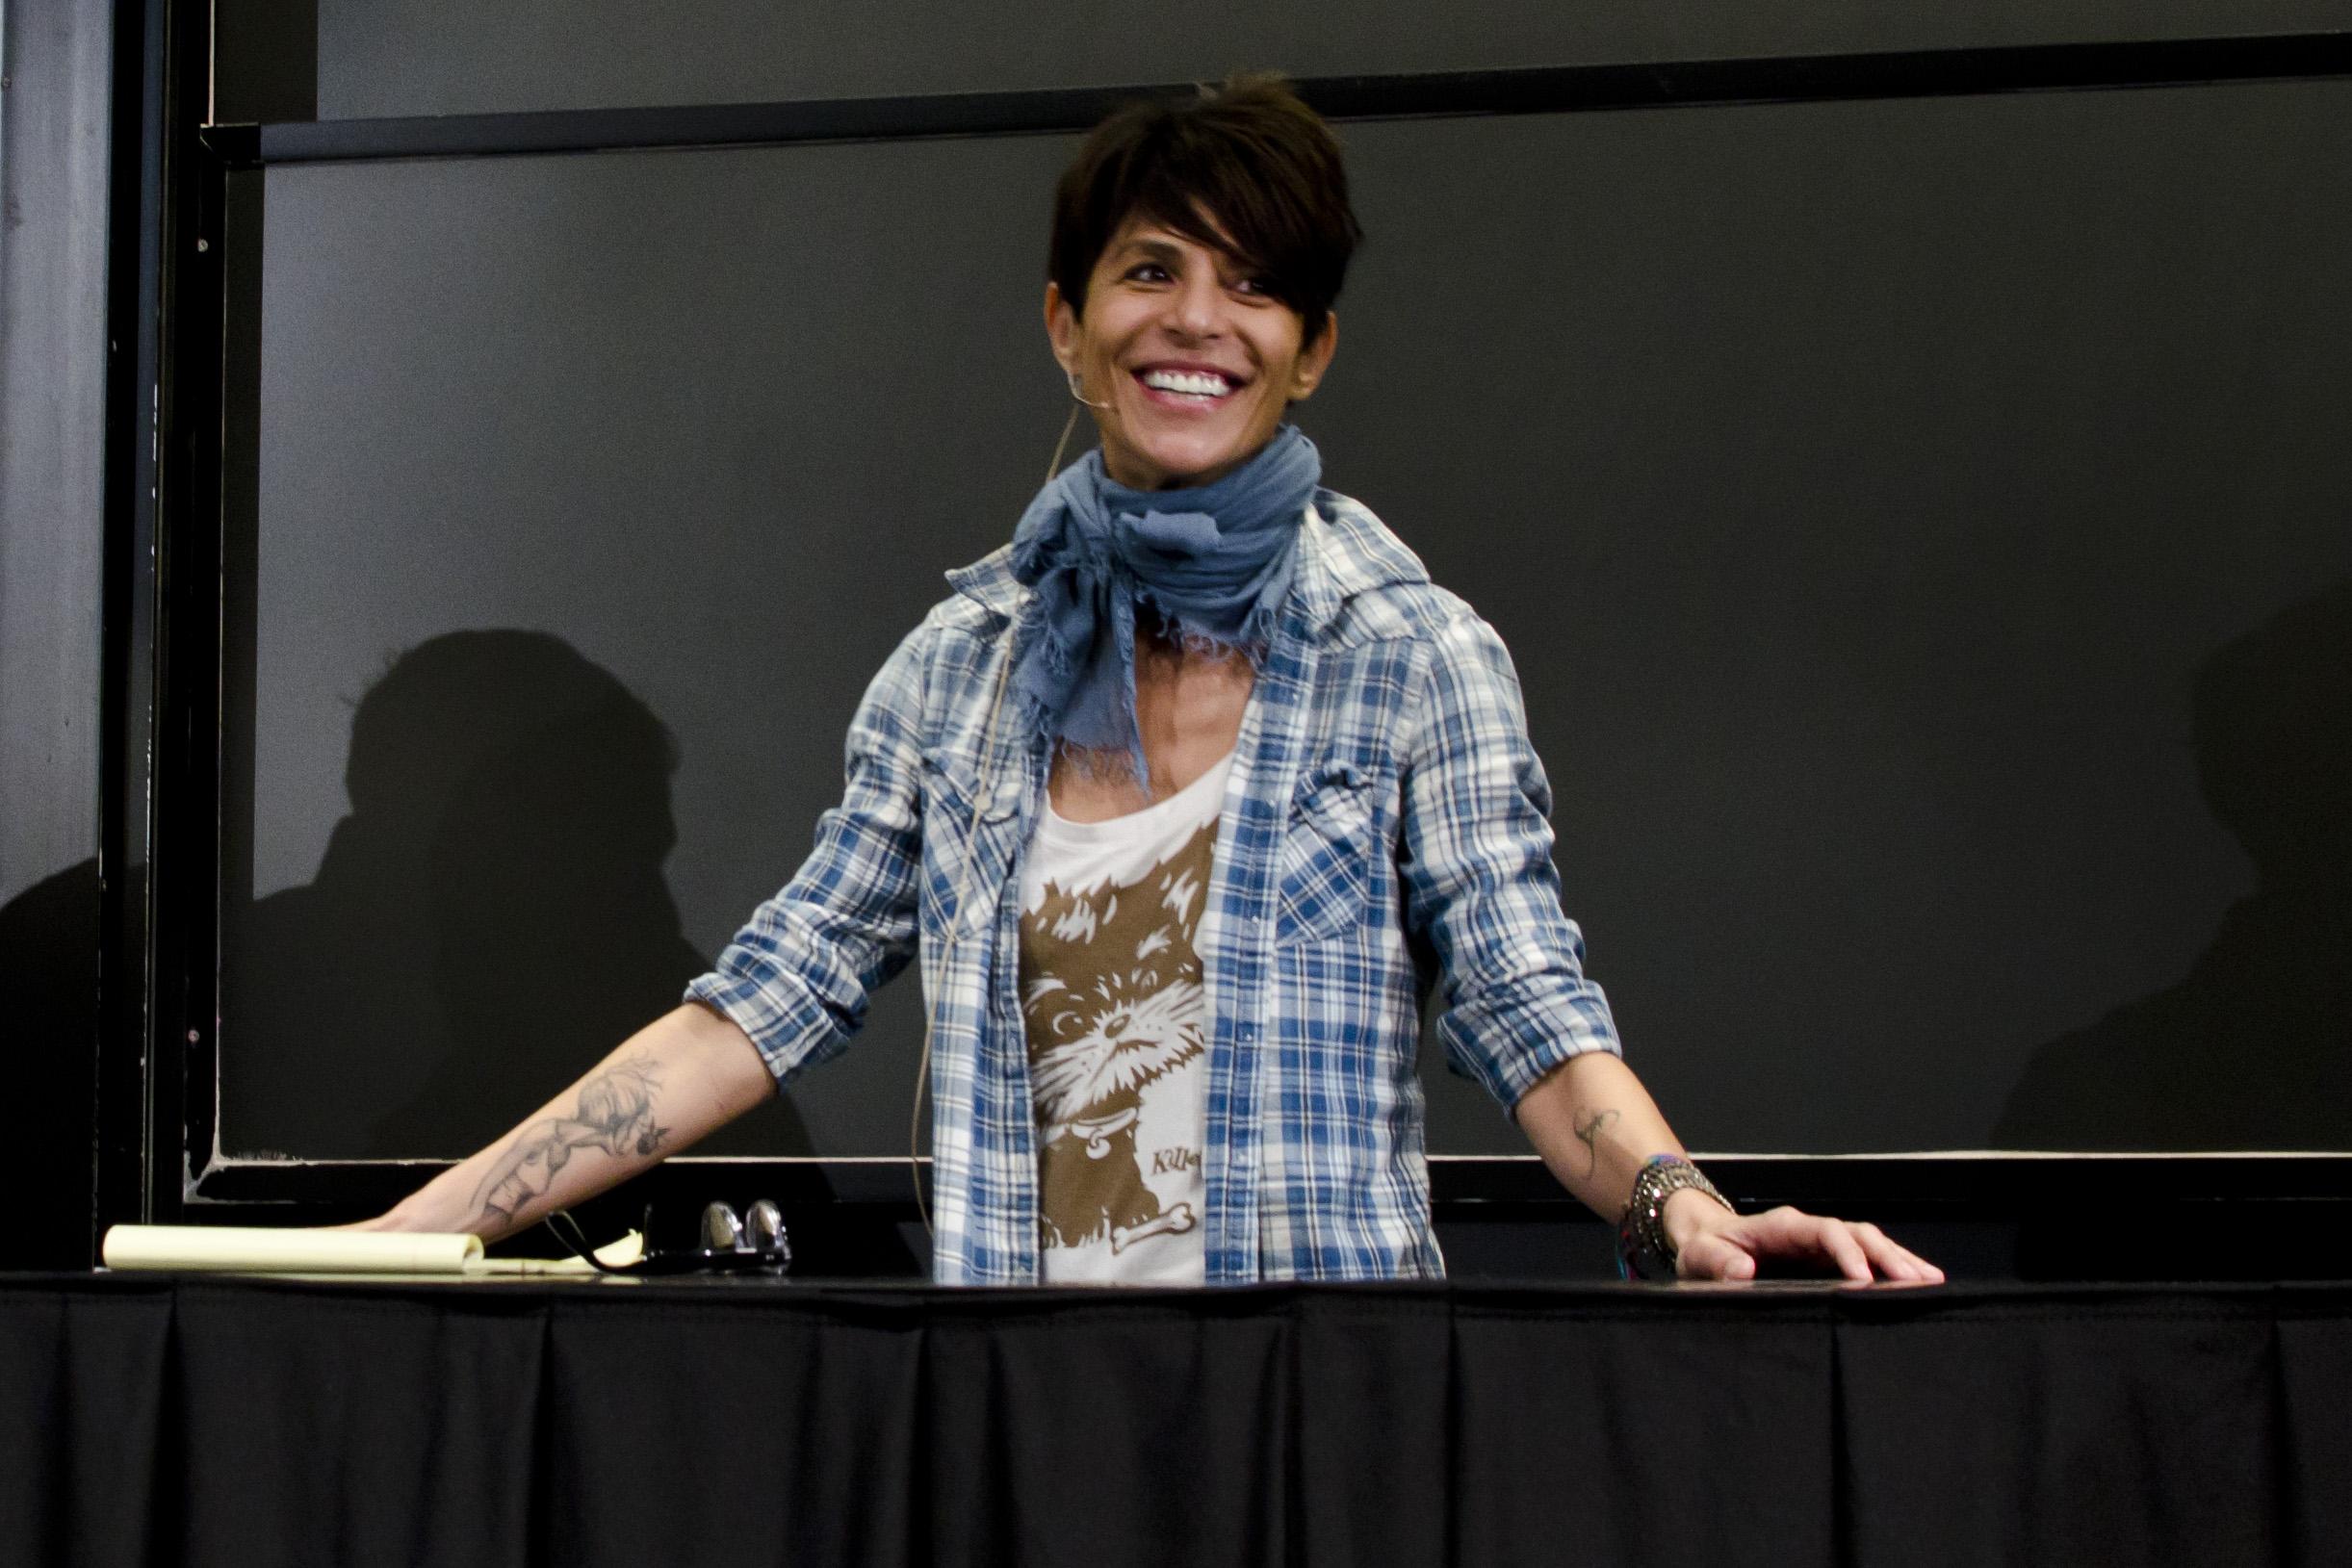 Dominique Crenn at Harvard, October 13, 2014